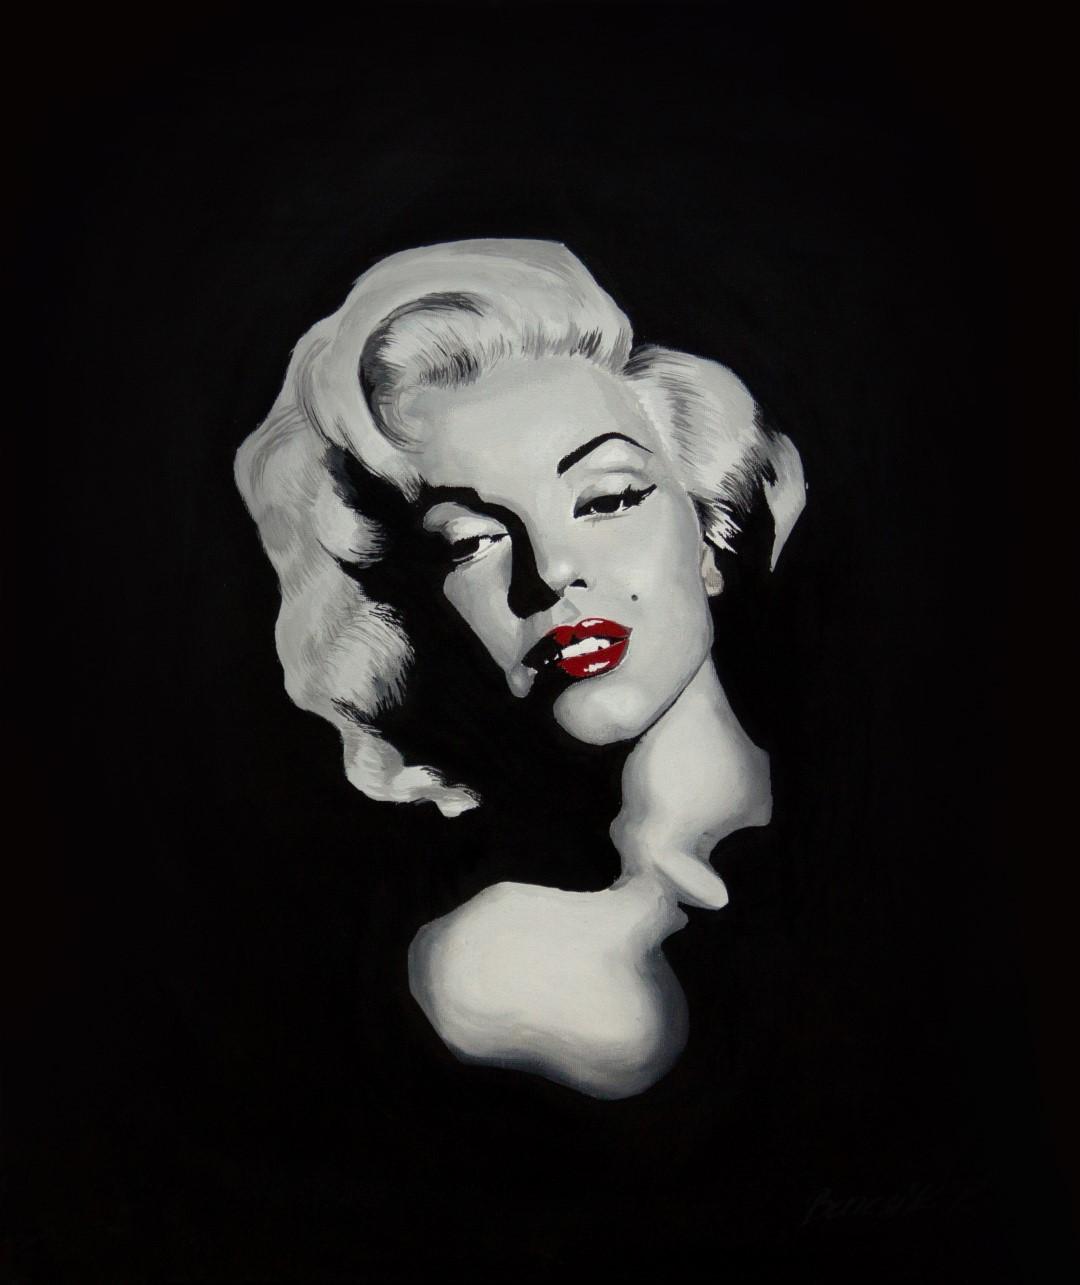 Olajportré – Monroe